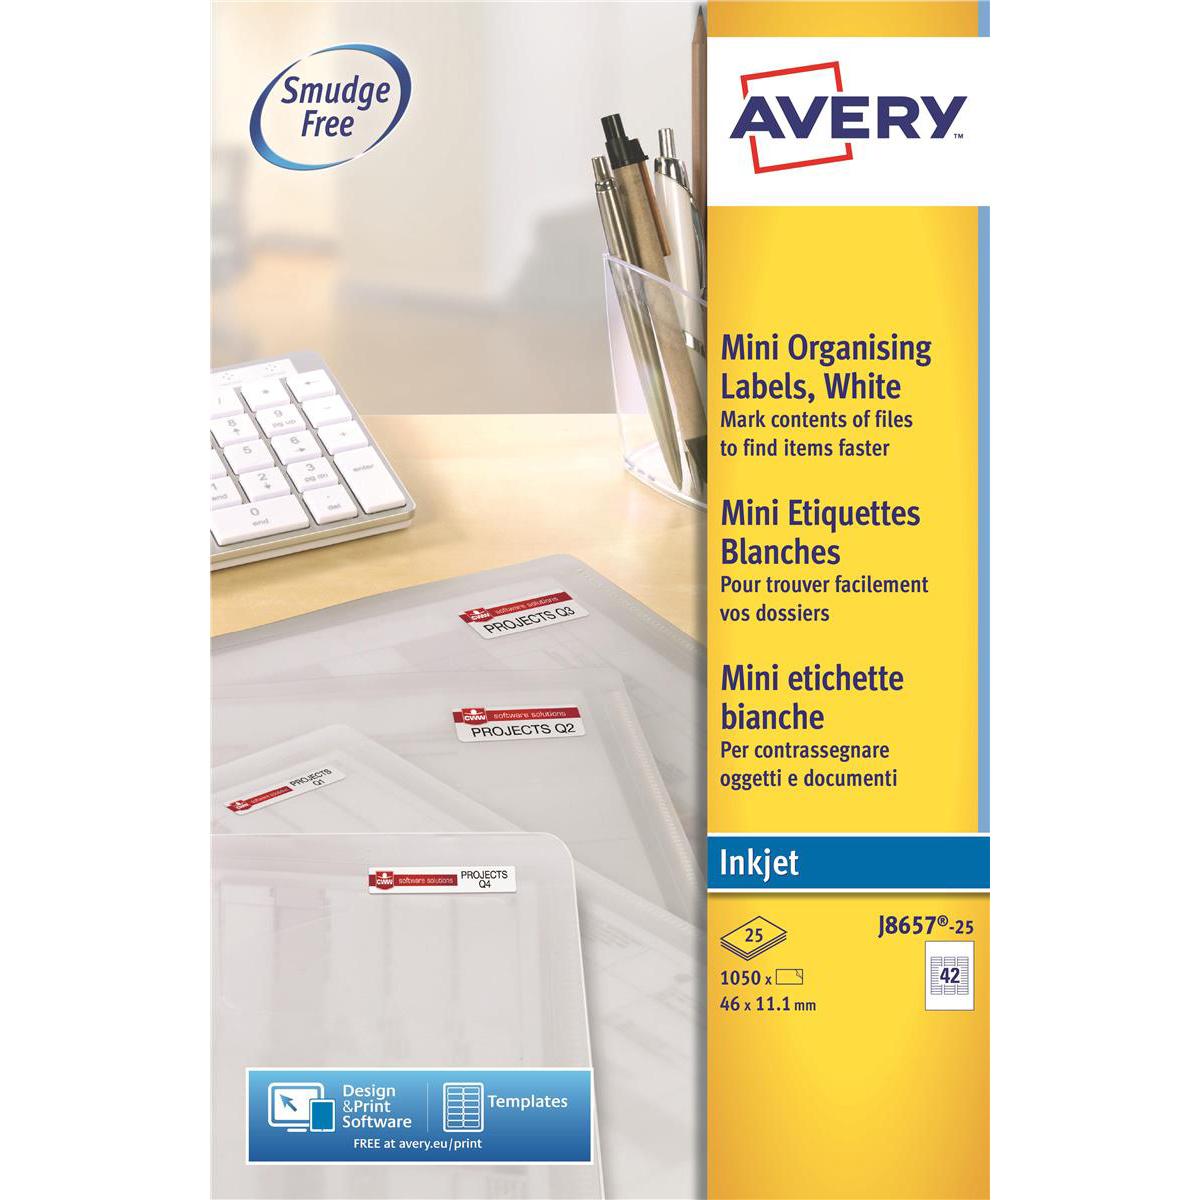 Avery Mini Multipurpose Labels Inkjet 42 per Sheet 35mm Film Slides 46x11.1mm Ref J8657-25 1050 Labels